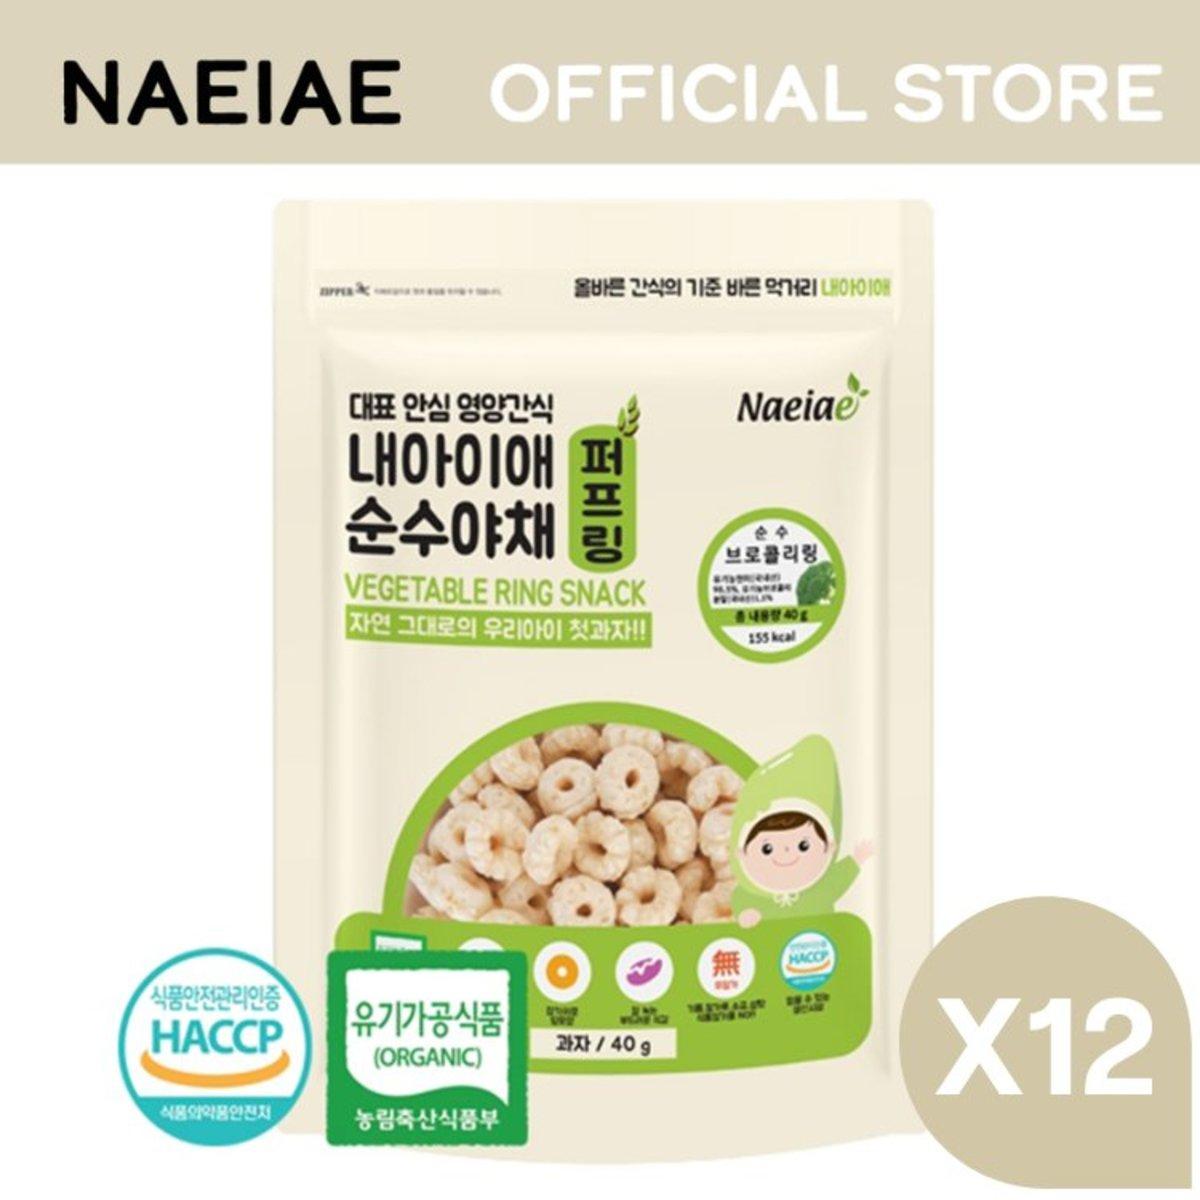 Naeiae 嬰兒蔬菜米圈圈 - 西蘭花 40g X12包